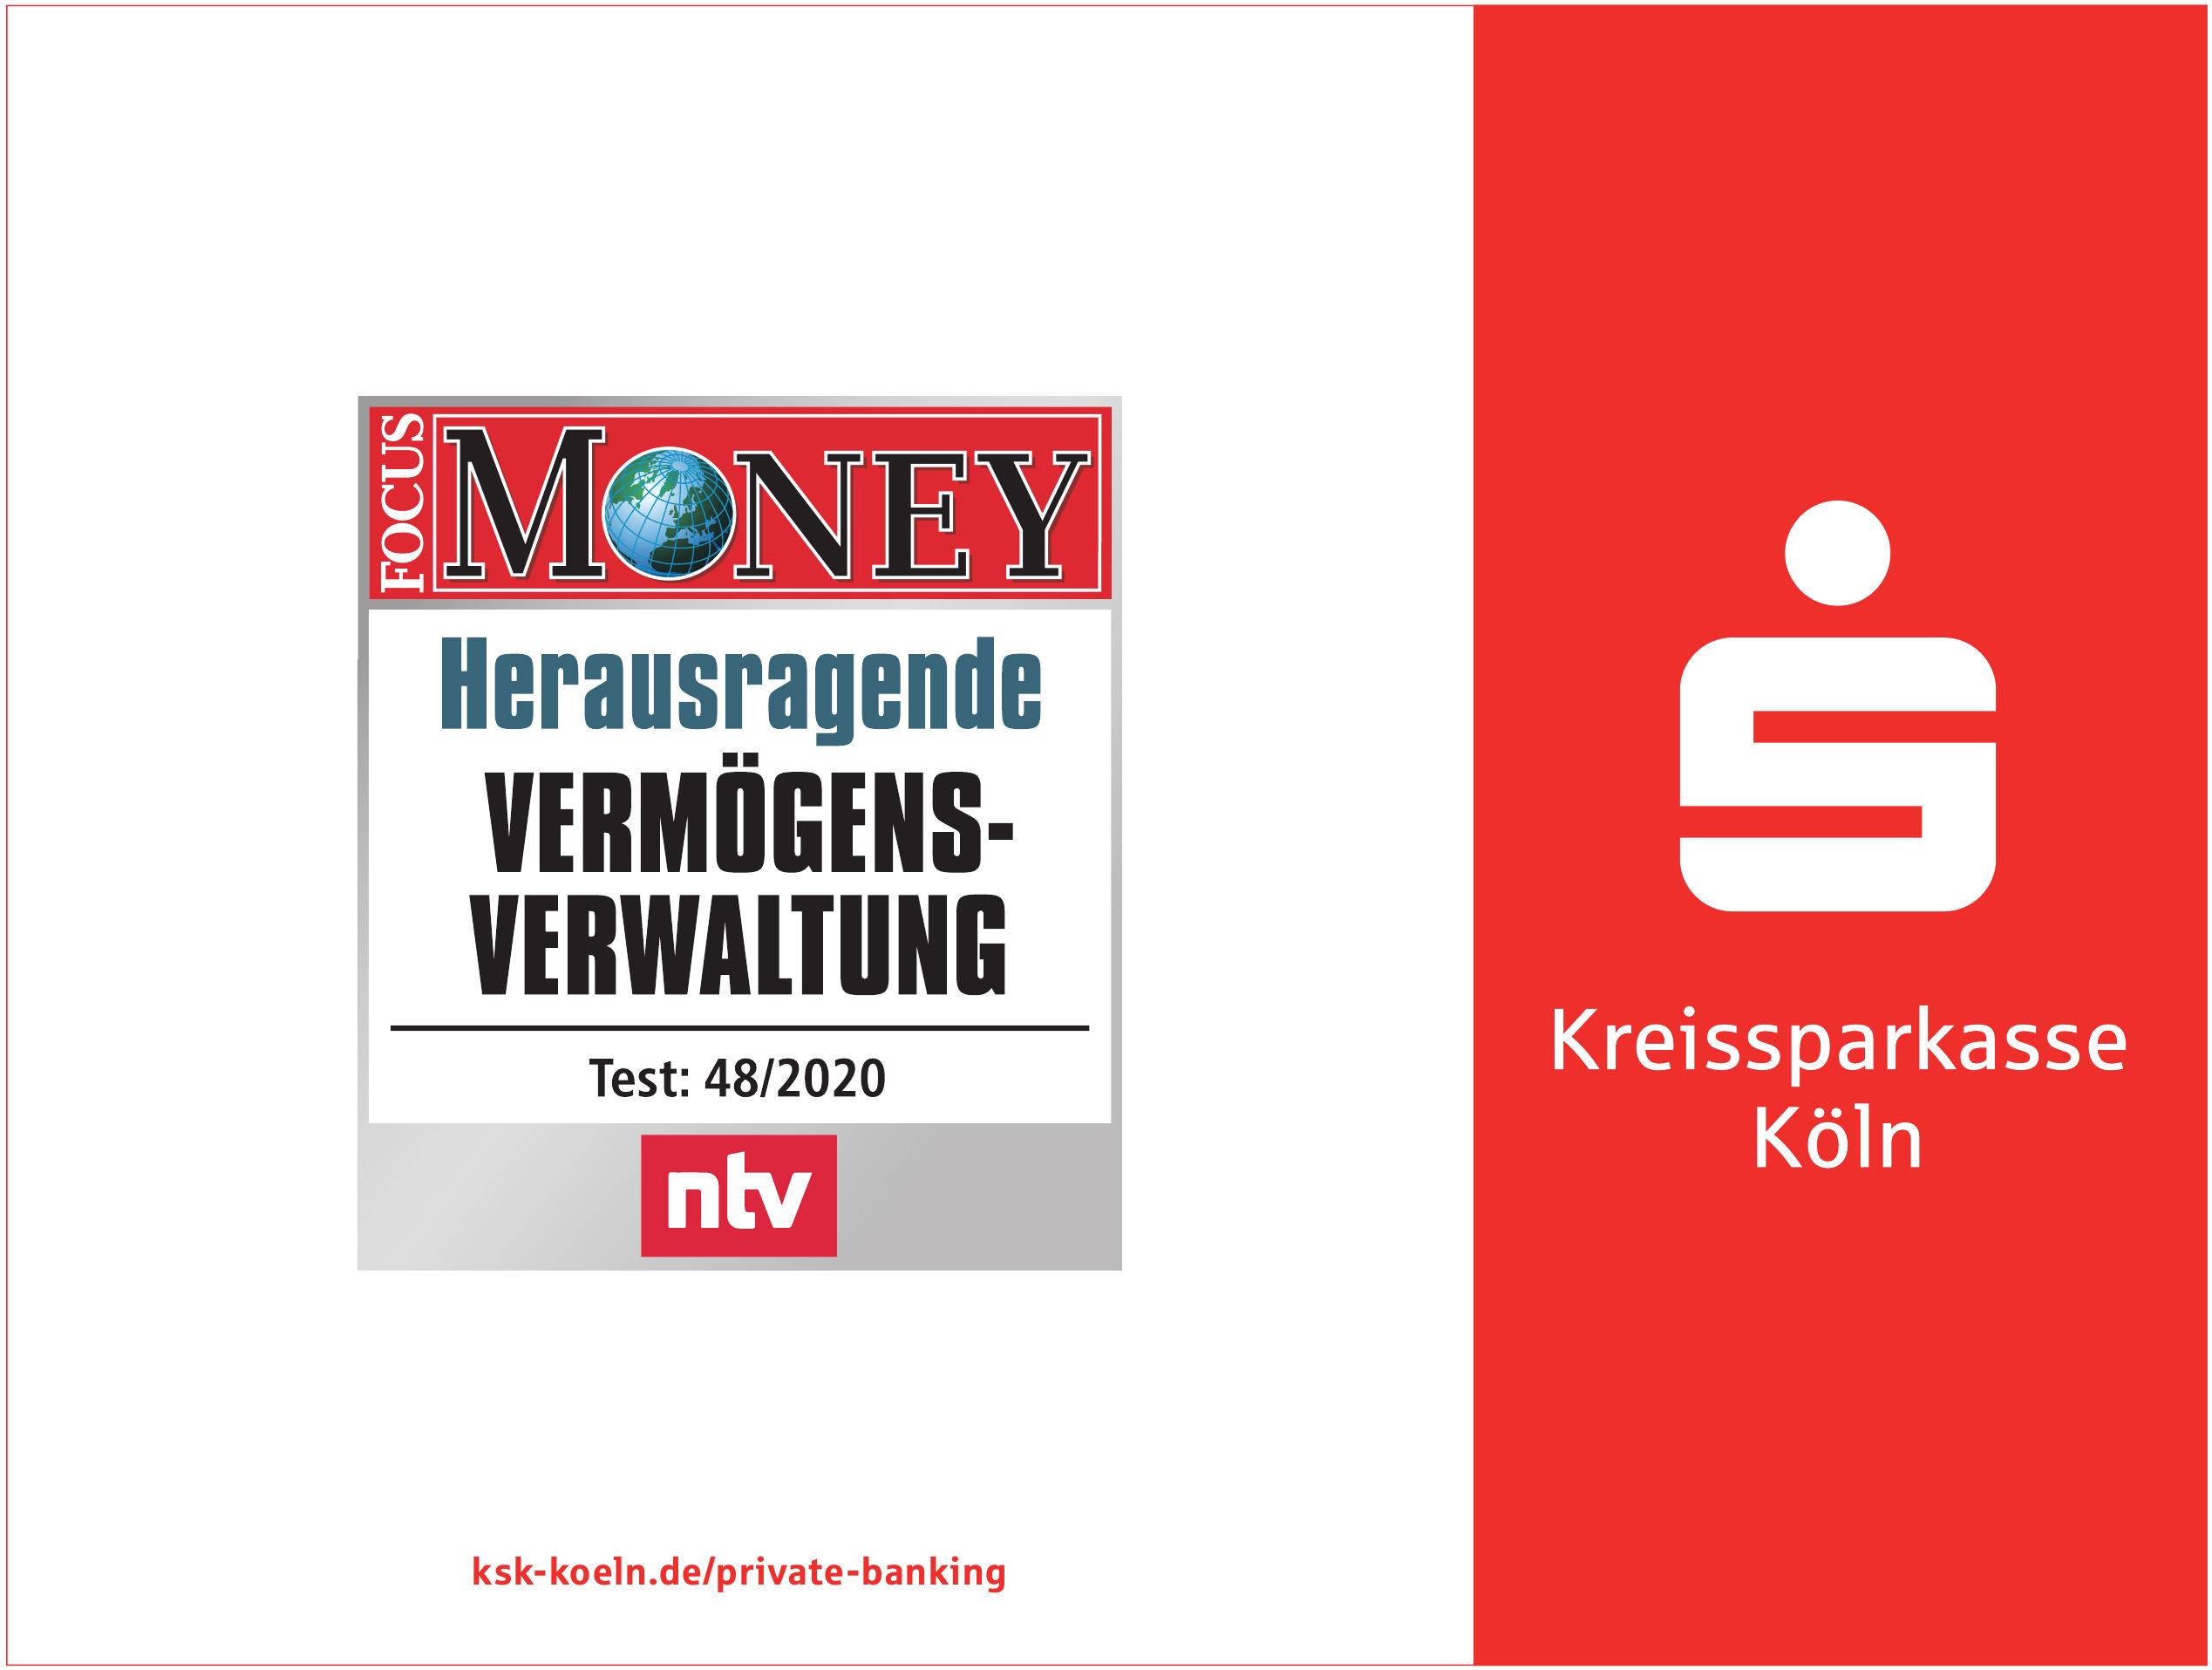 Kreissparkasse Köln - Private Banking